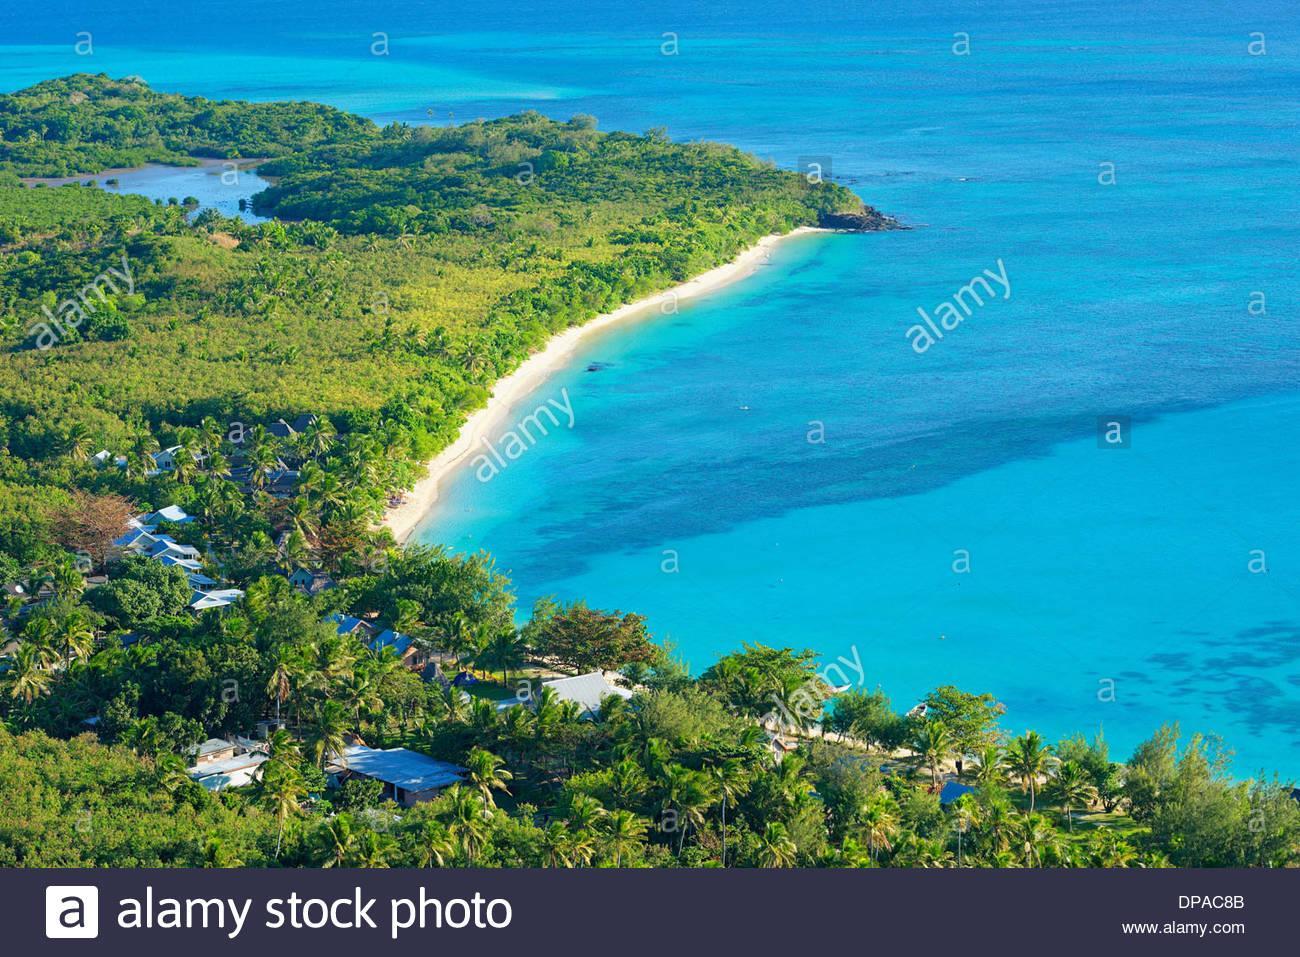 Blue Lagoon, Nacula island, Yasawa island group, Fiji, South Pacific - Stock Image